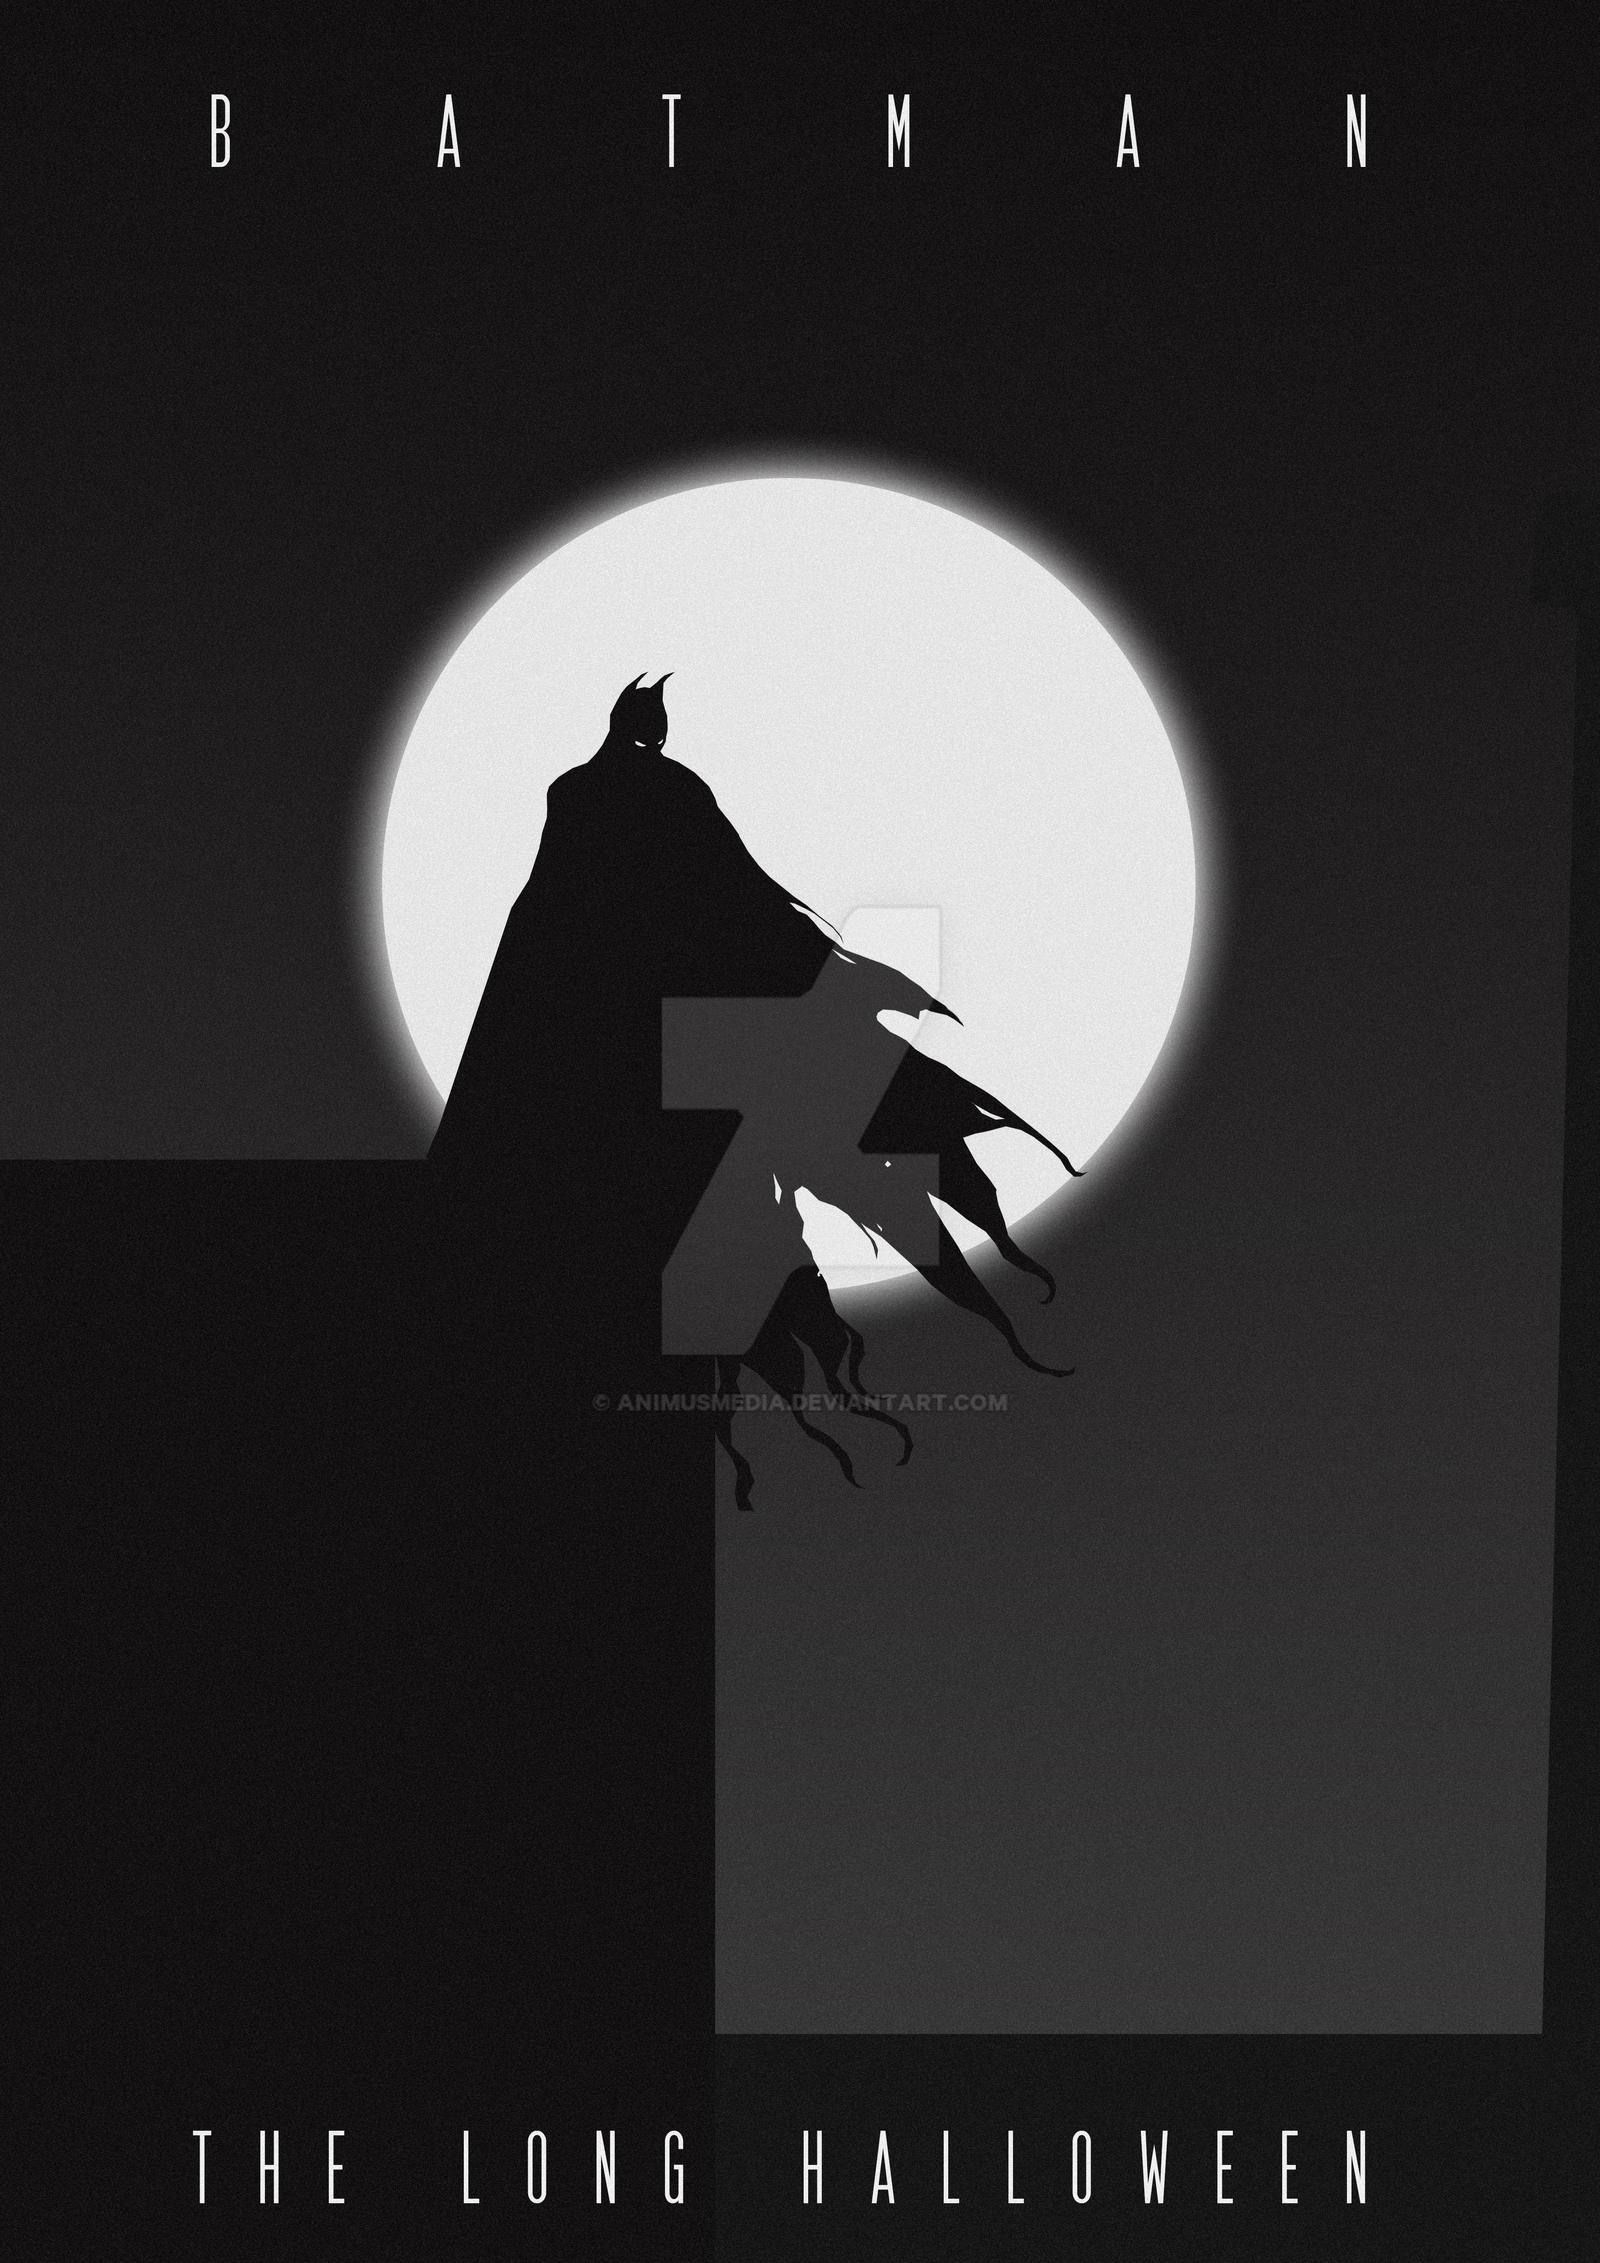 BATMAN: The Long Halloween by AnimusMedia on DeviantArt